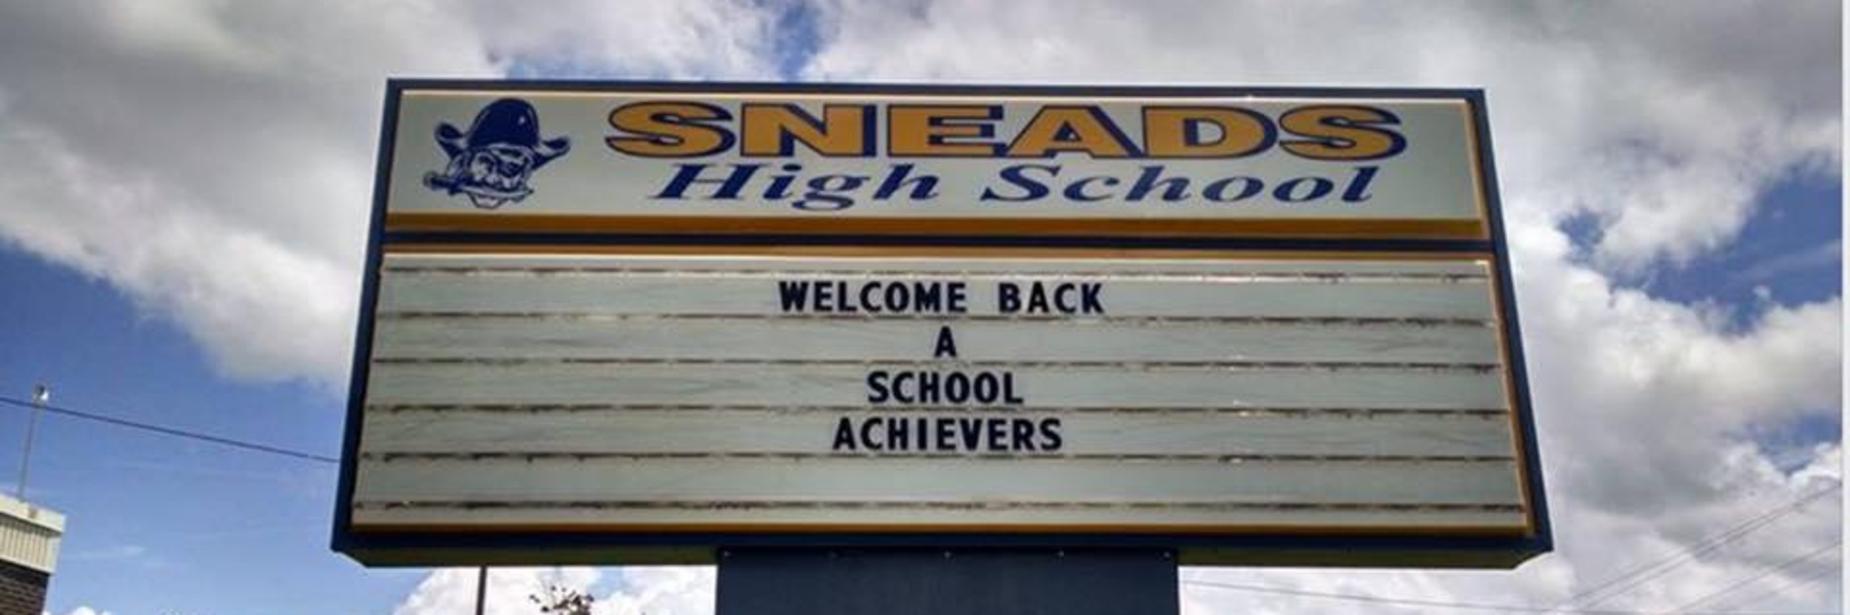 Sneads High School Sign